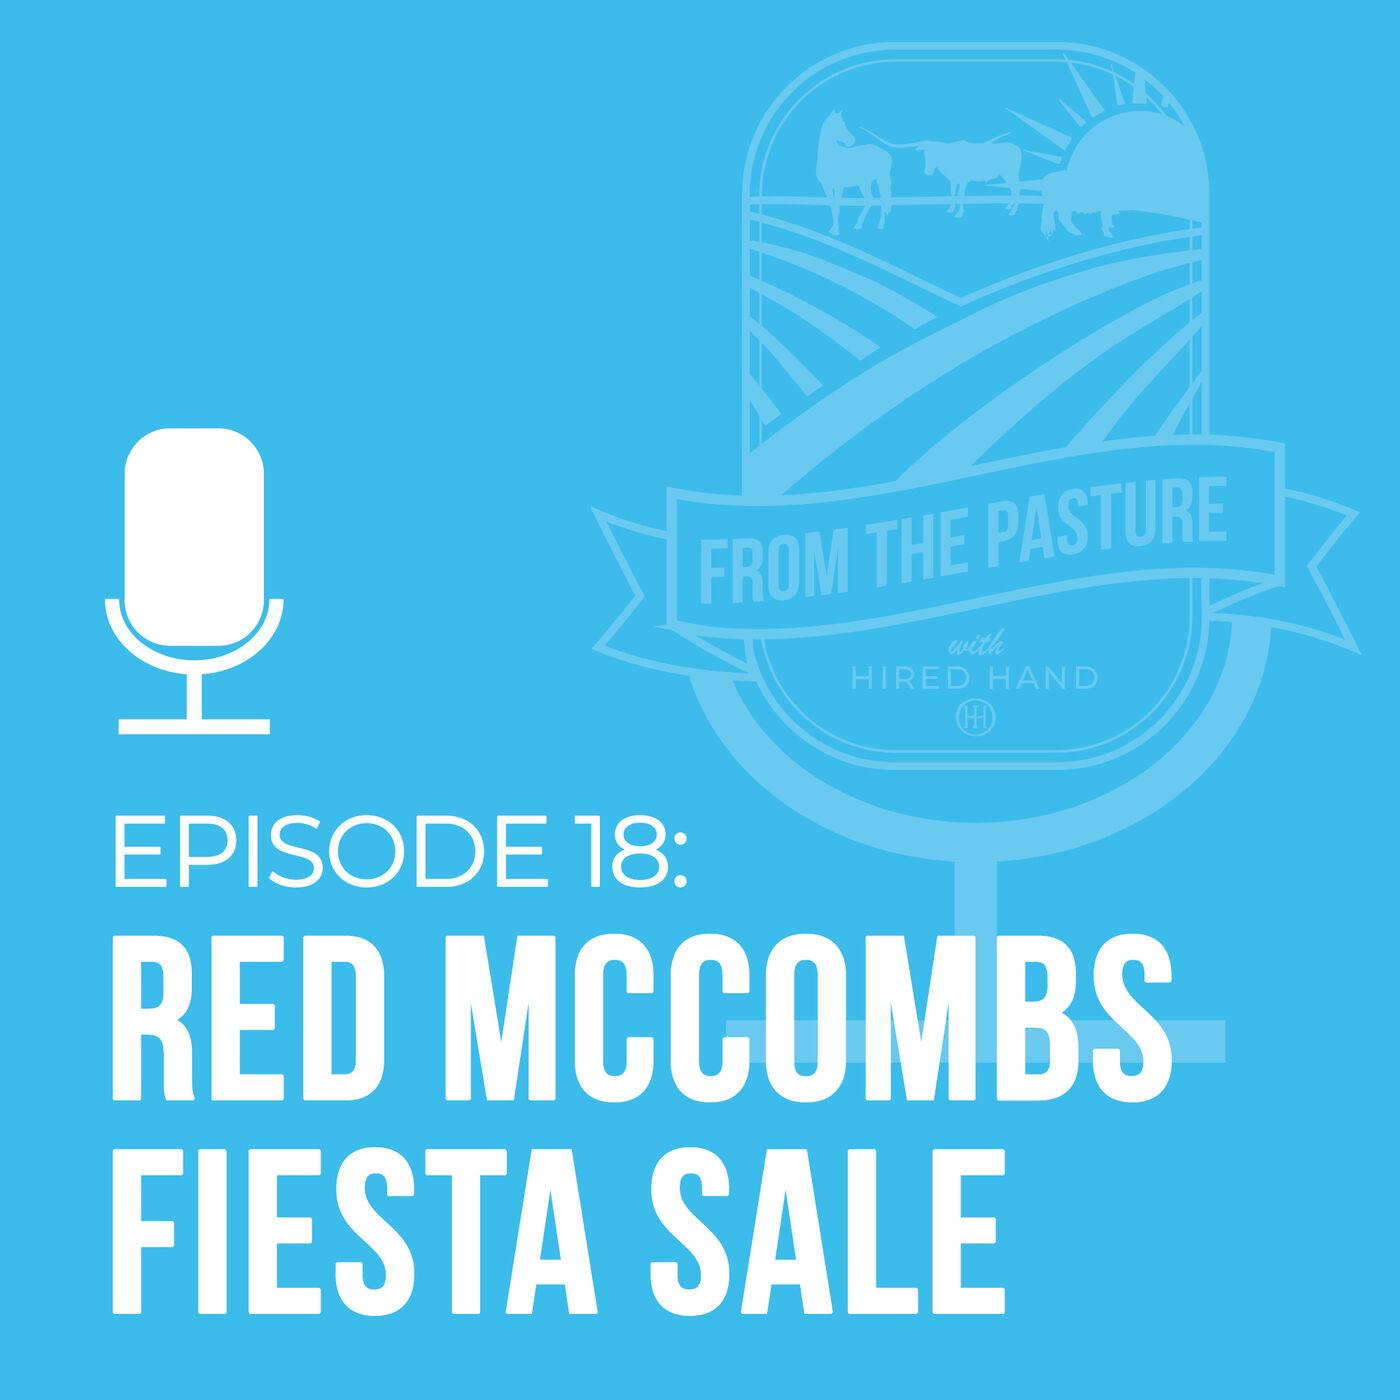 Red McCombs Fiesta Sale